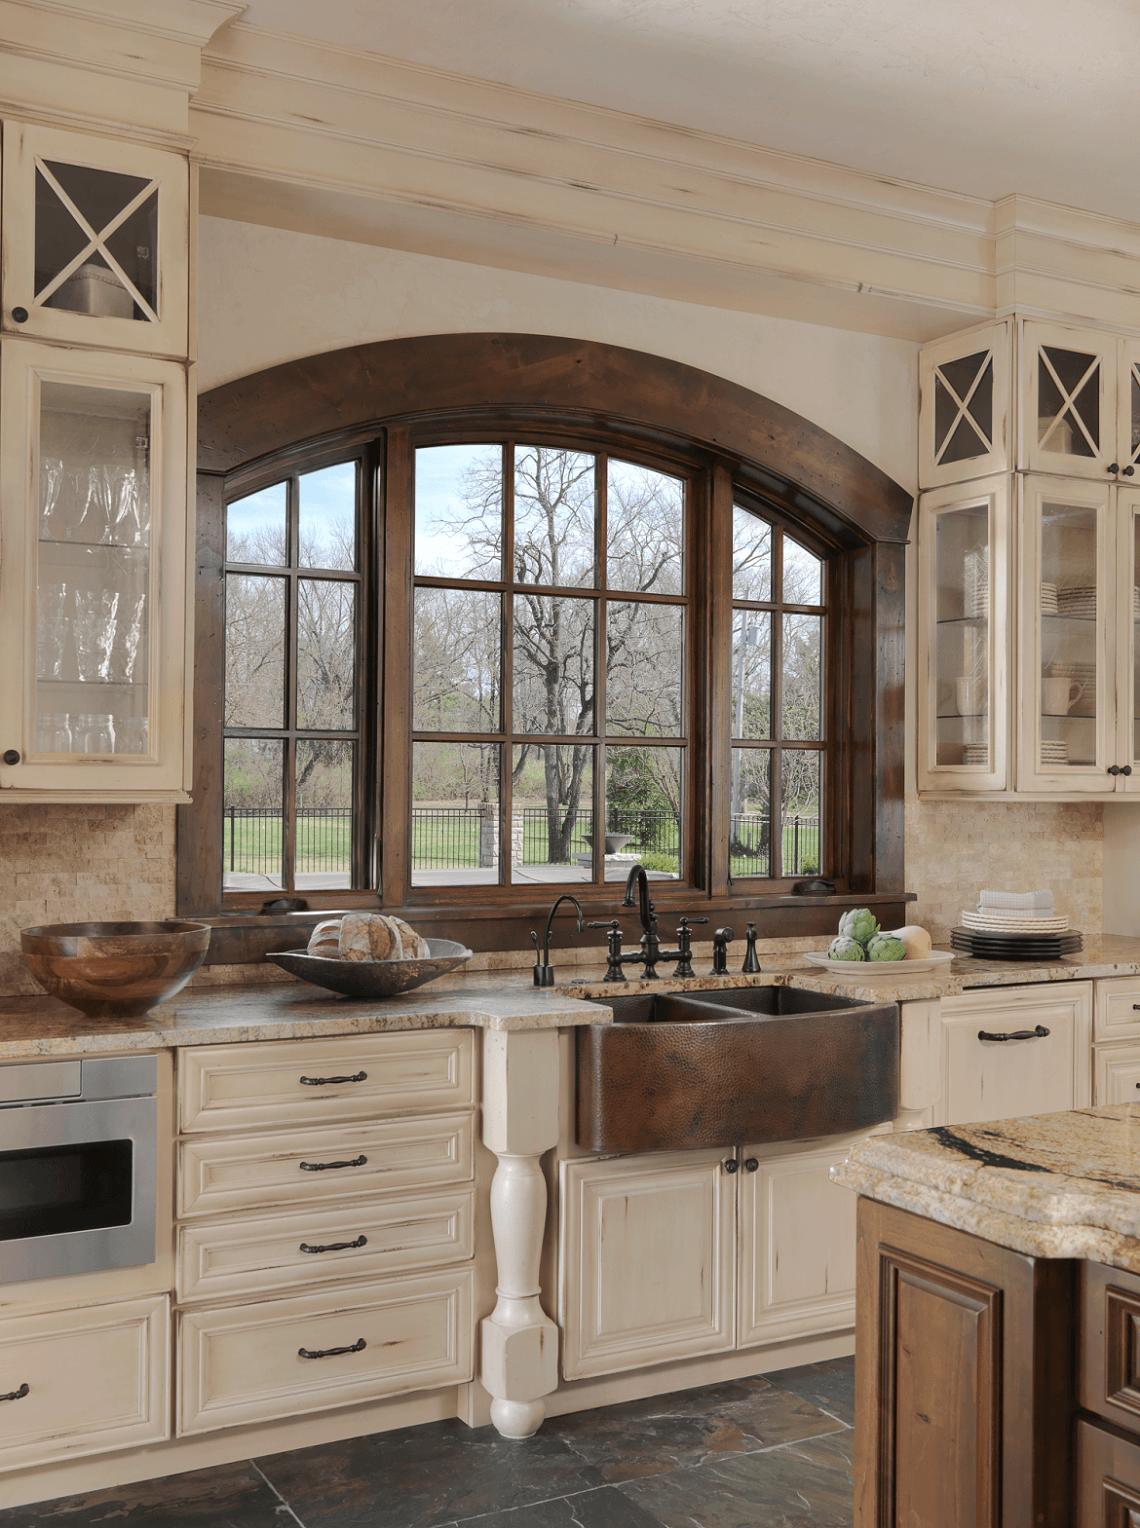 Old World Inspired Kitchen Rustic Farmhouse Kitchen Farmhouse